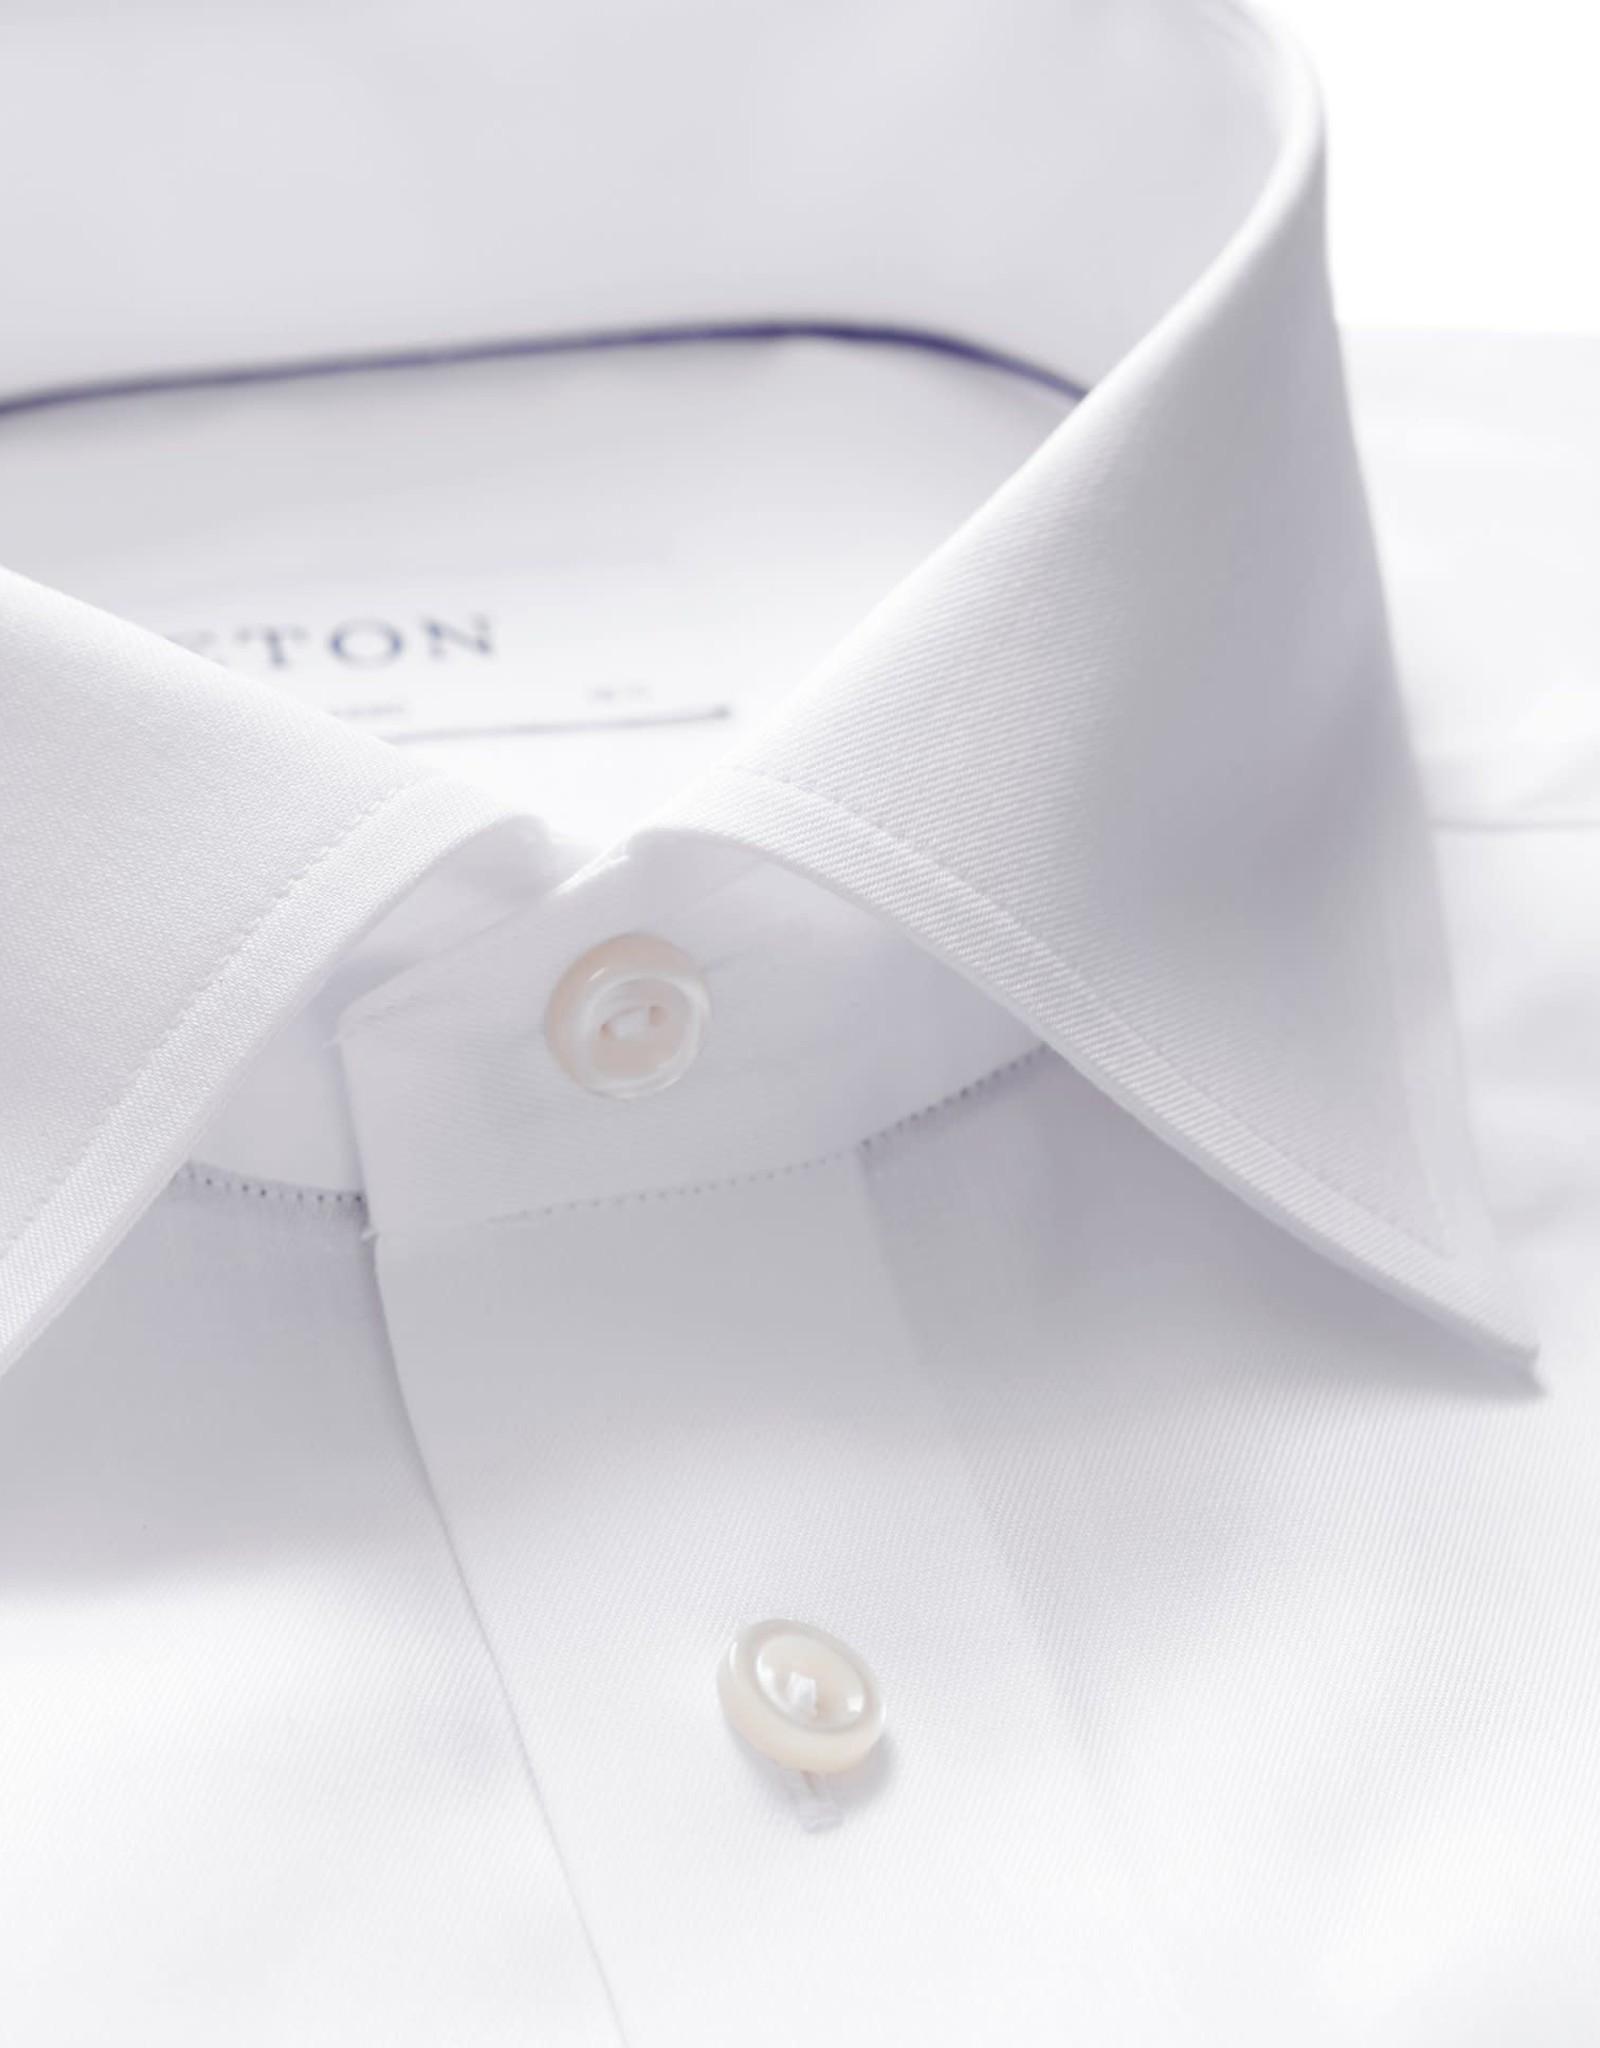 Eton Eton hemd wit classic 3000-79011